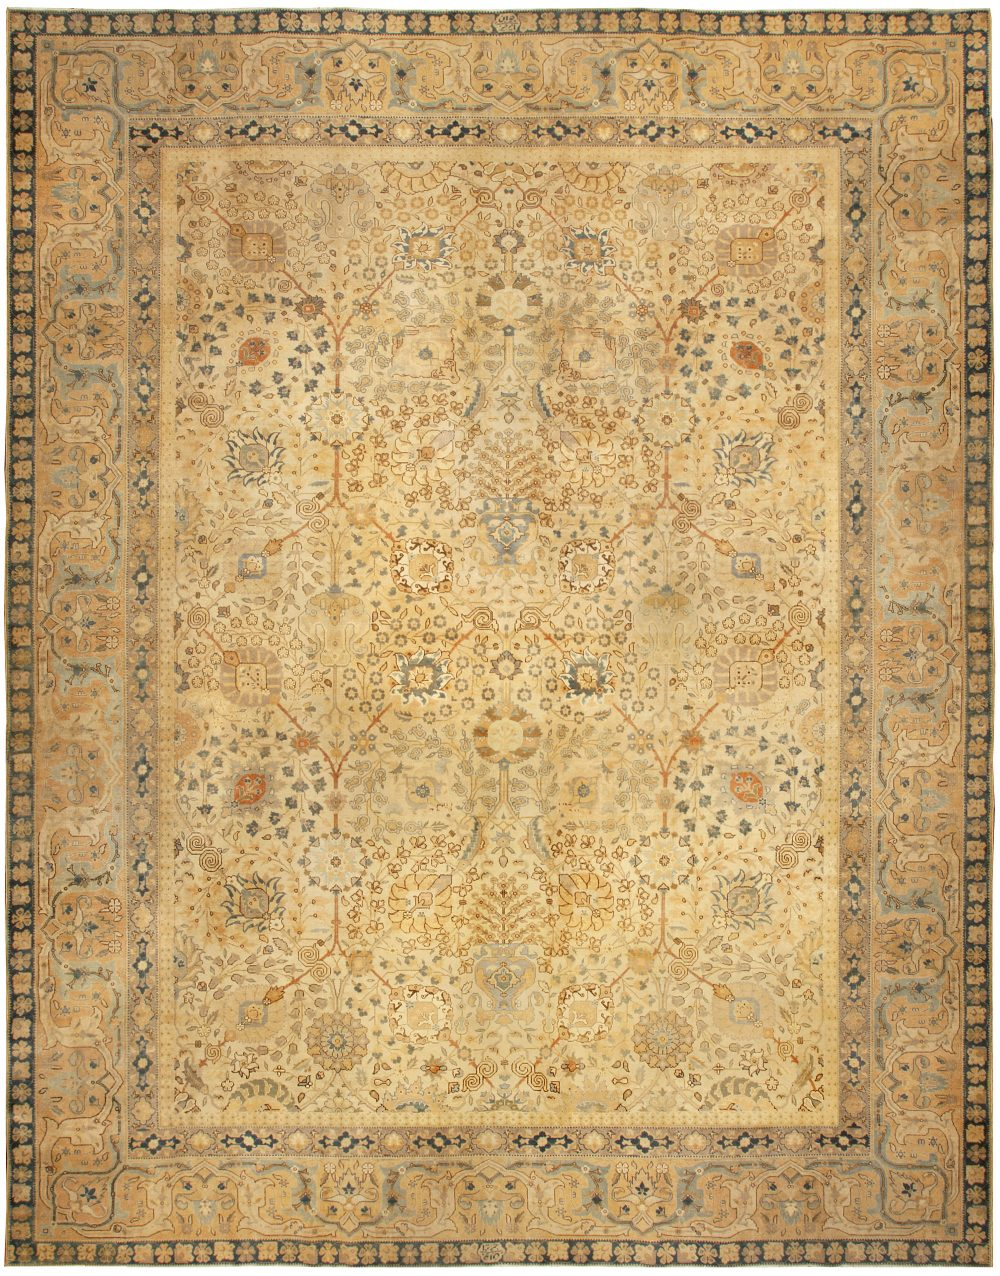 Antique Persian Tabriz Rug BB4938